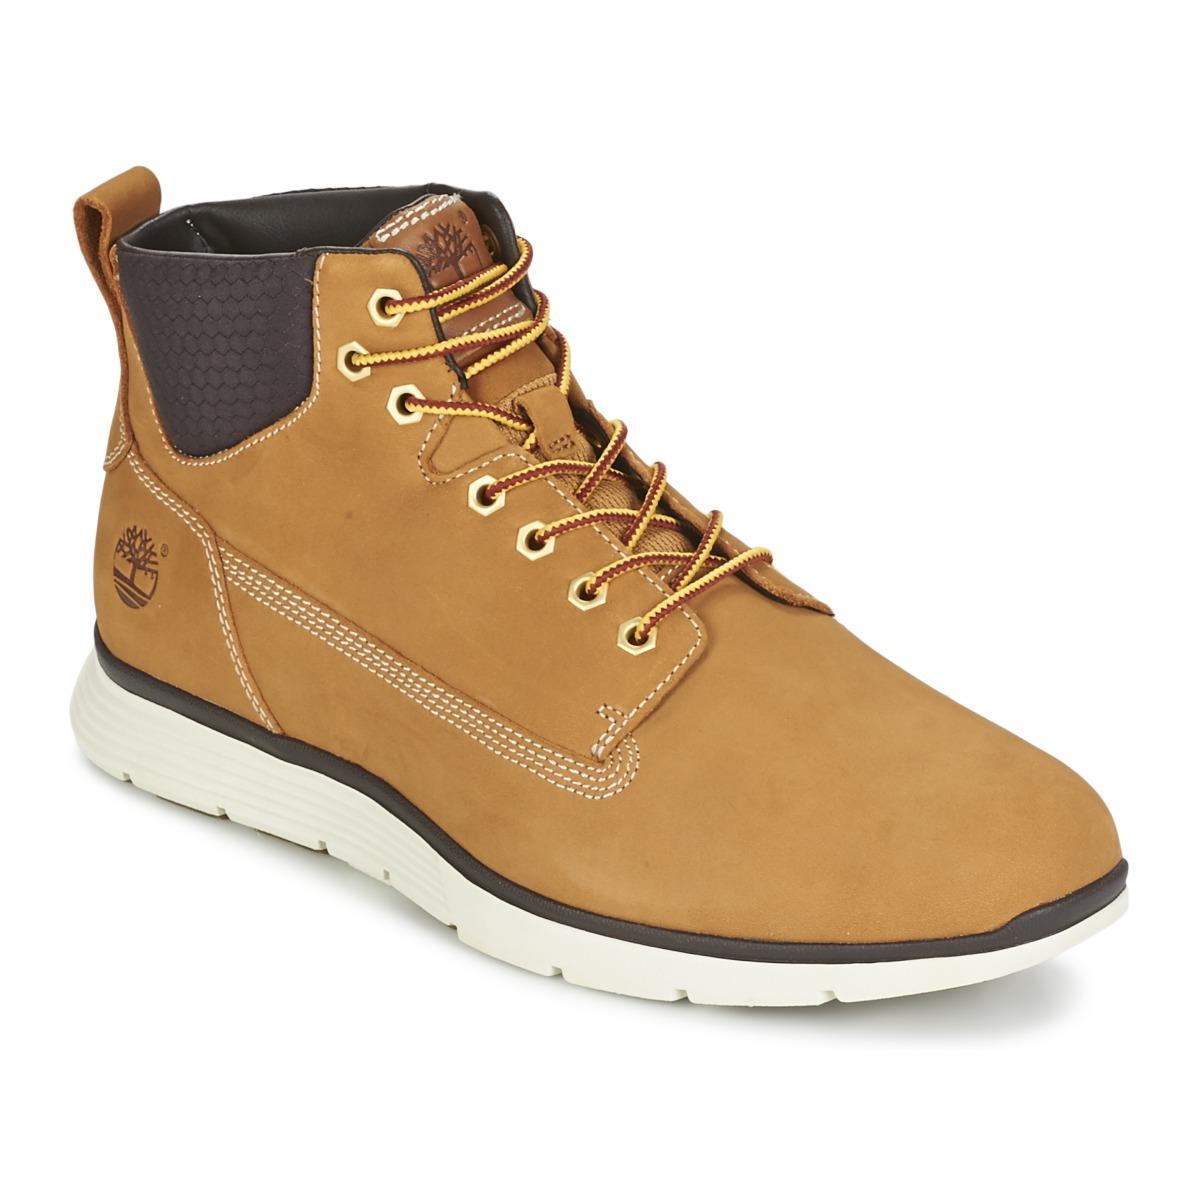 Womens Leather Chukka Shoes